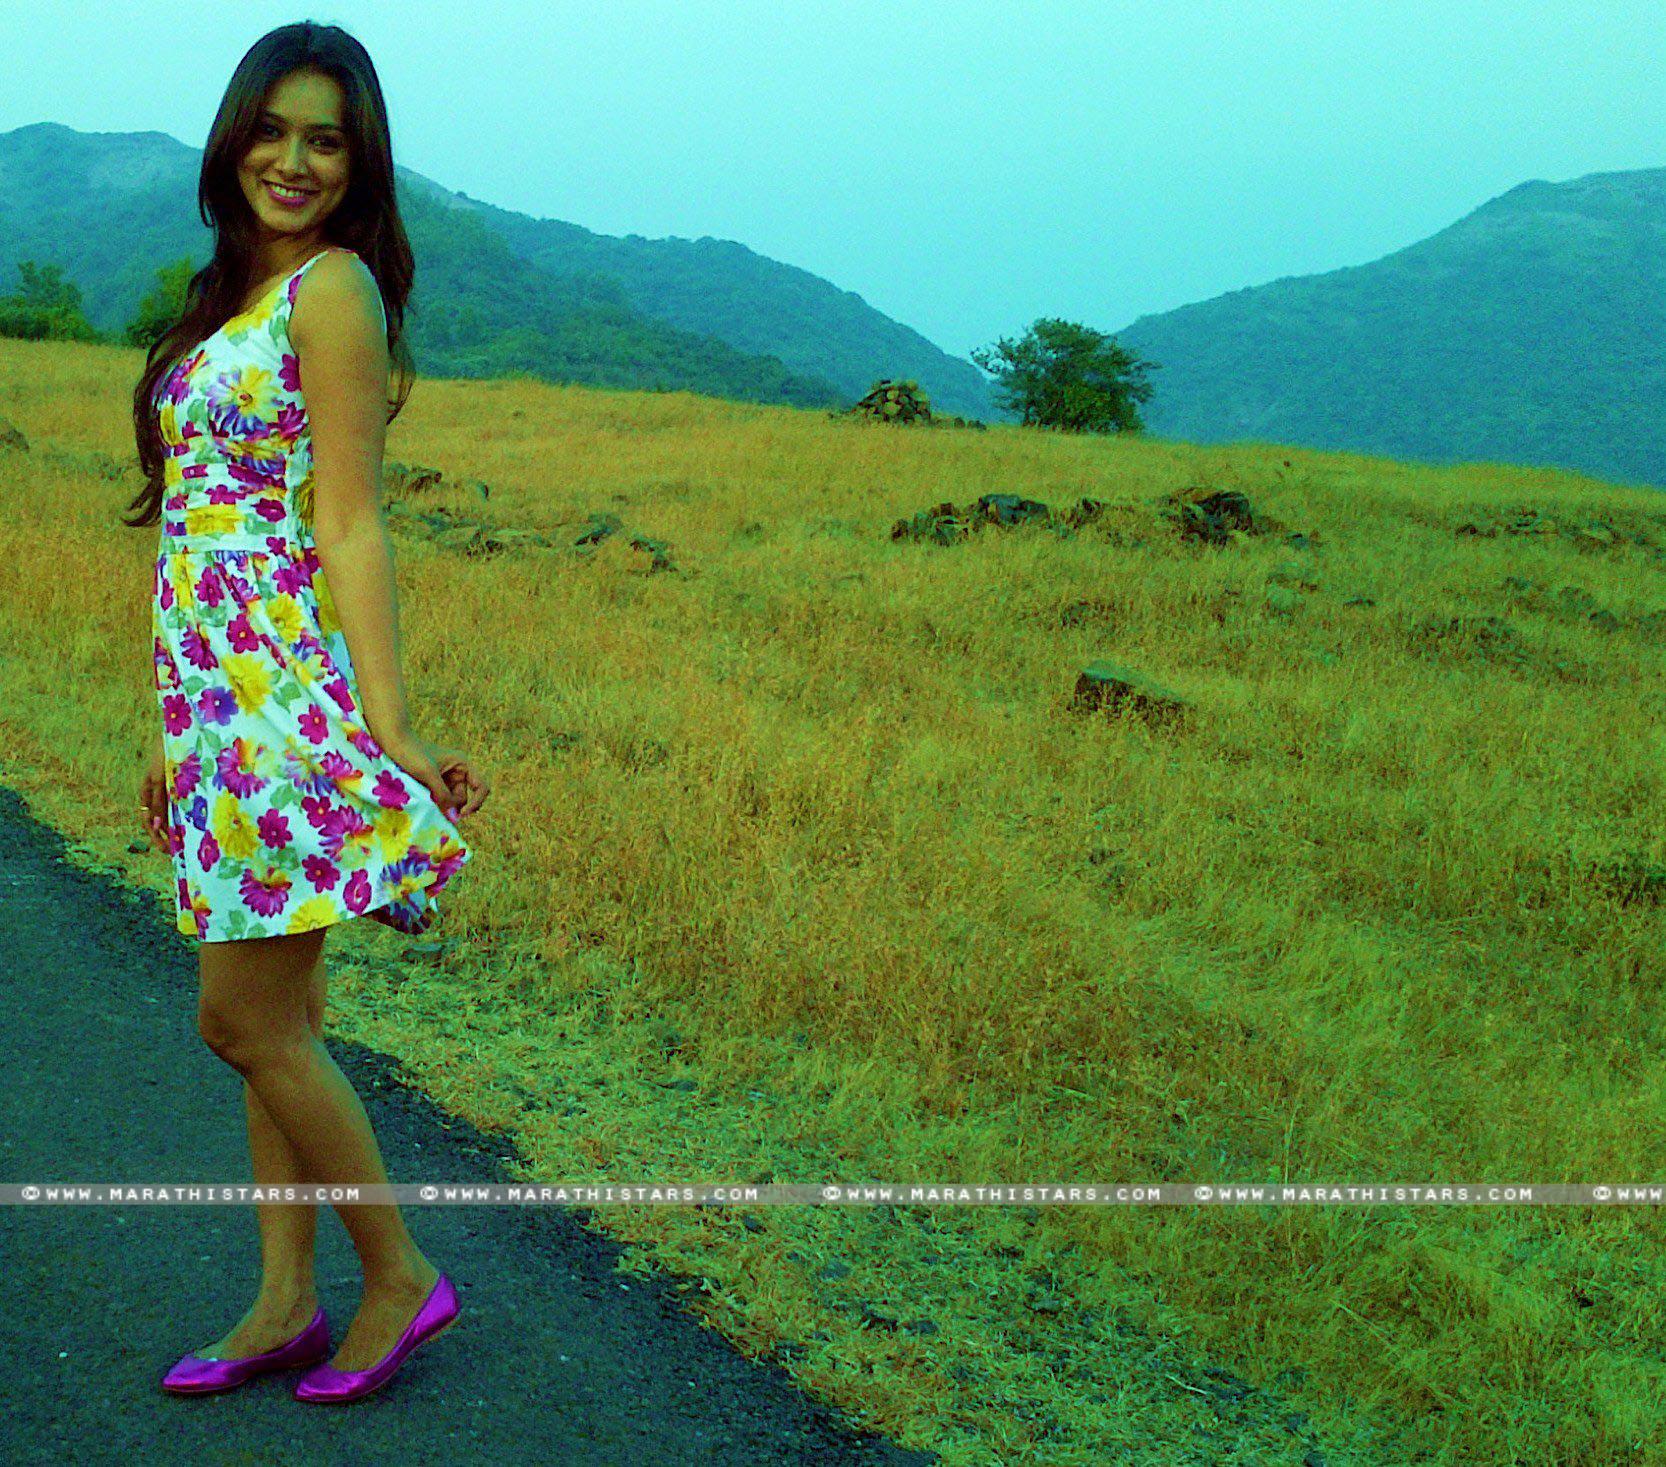 pallavi subhash marathi actress photosbiography